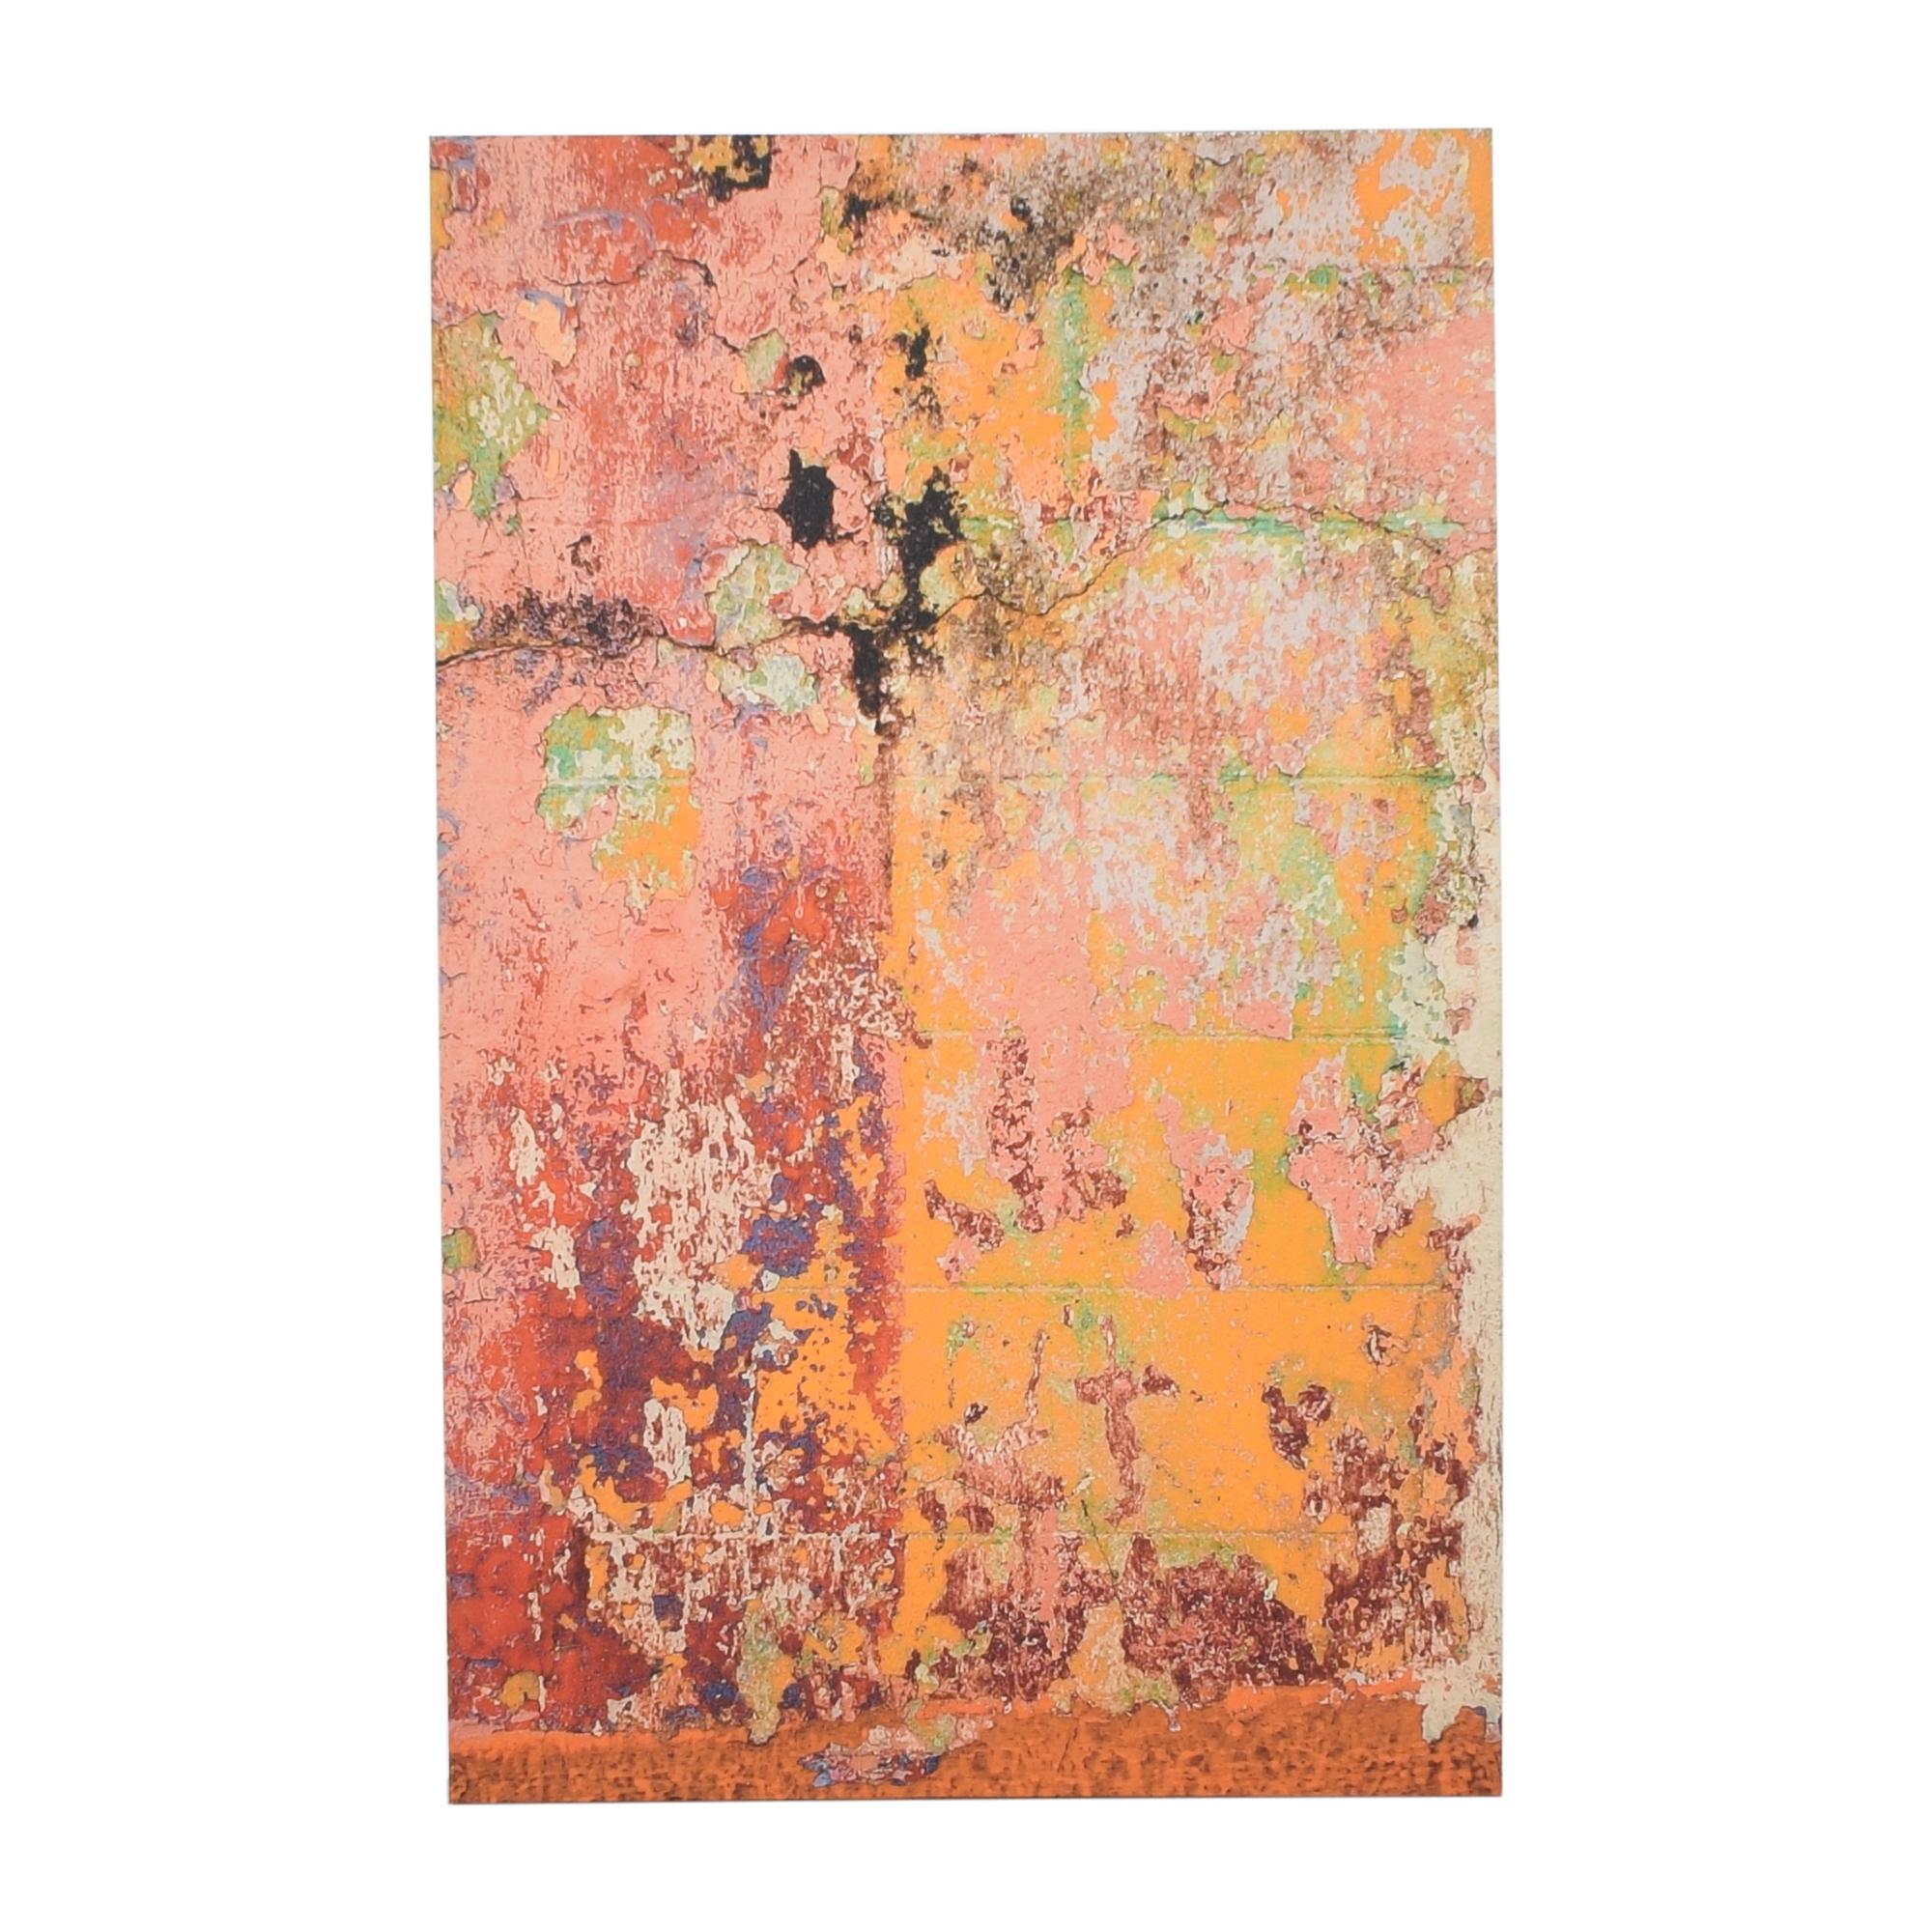 buy Michael Heller Cozumel 492 Wall Art  Decor